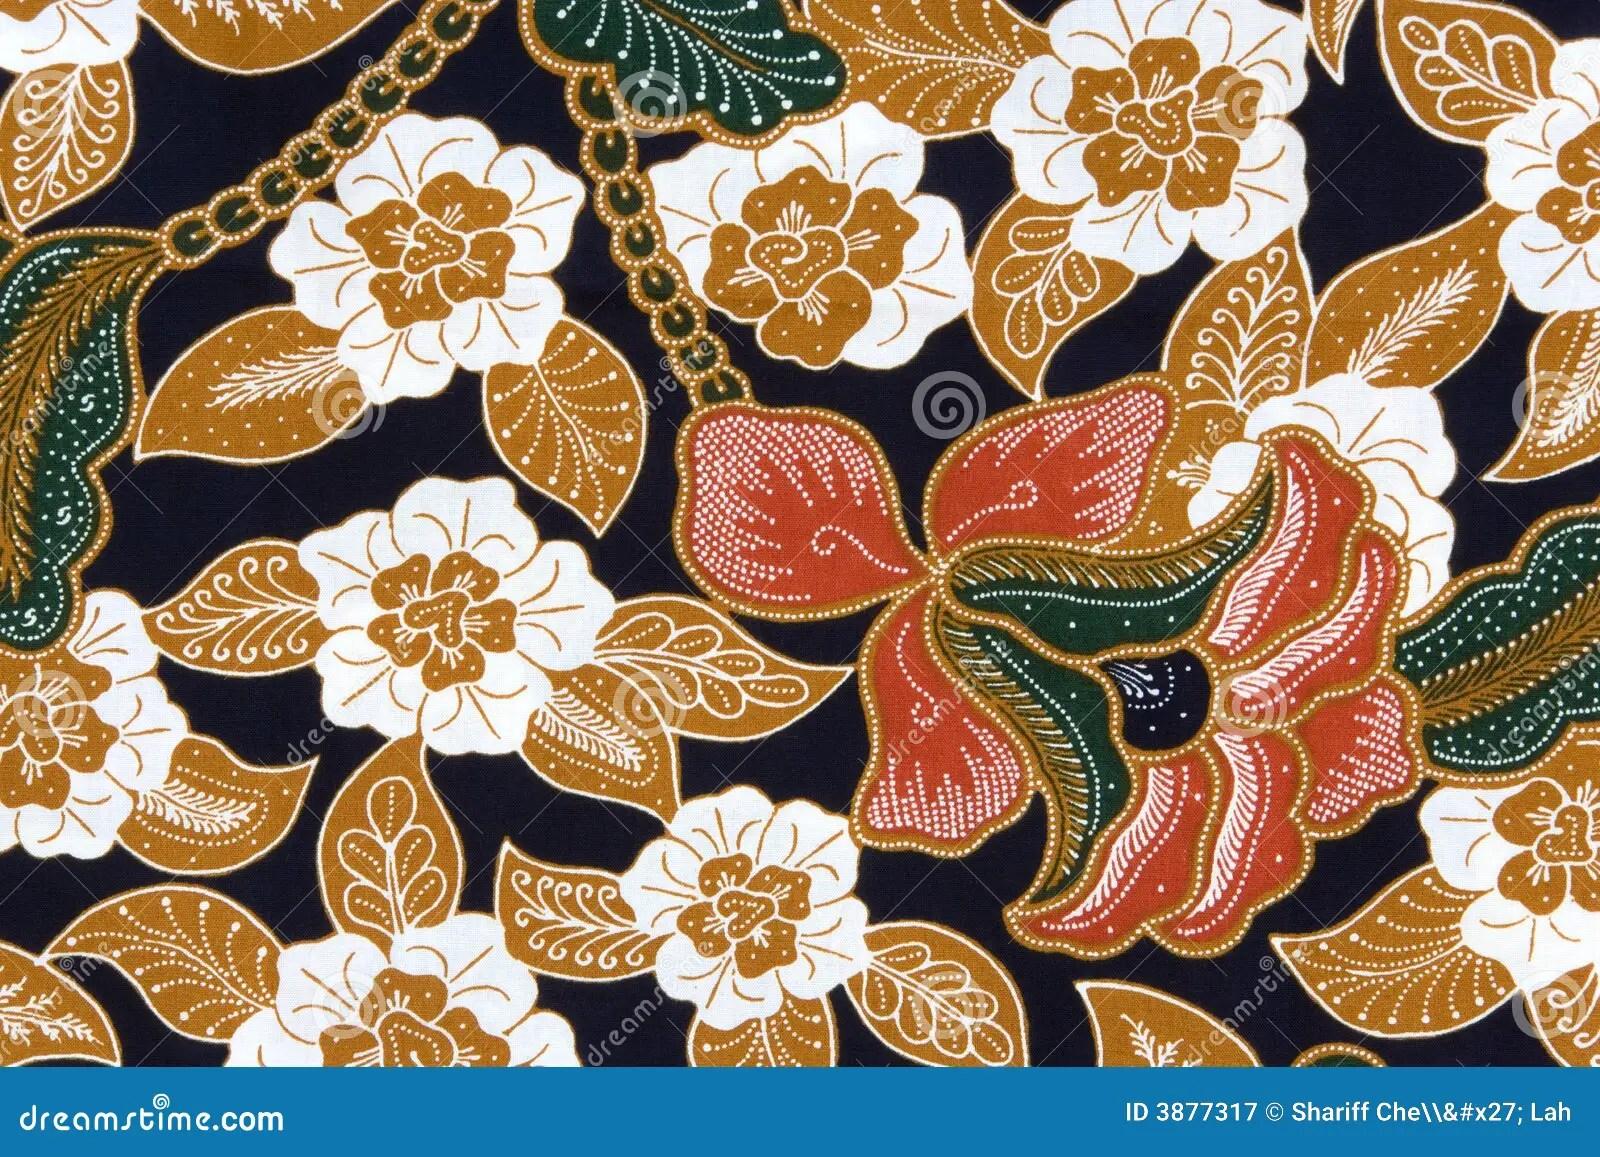 Indonesian Batik Sarong stock image Image of fashion